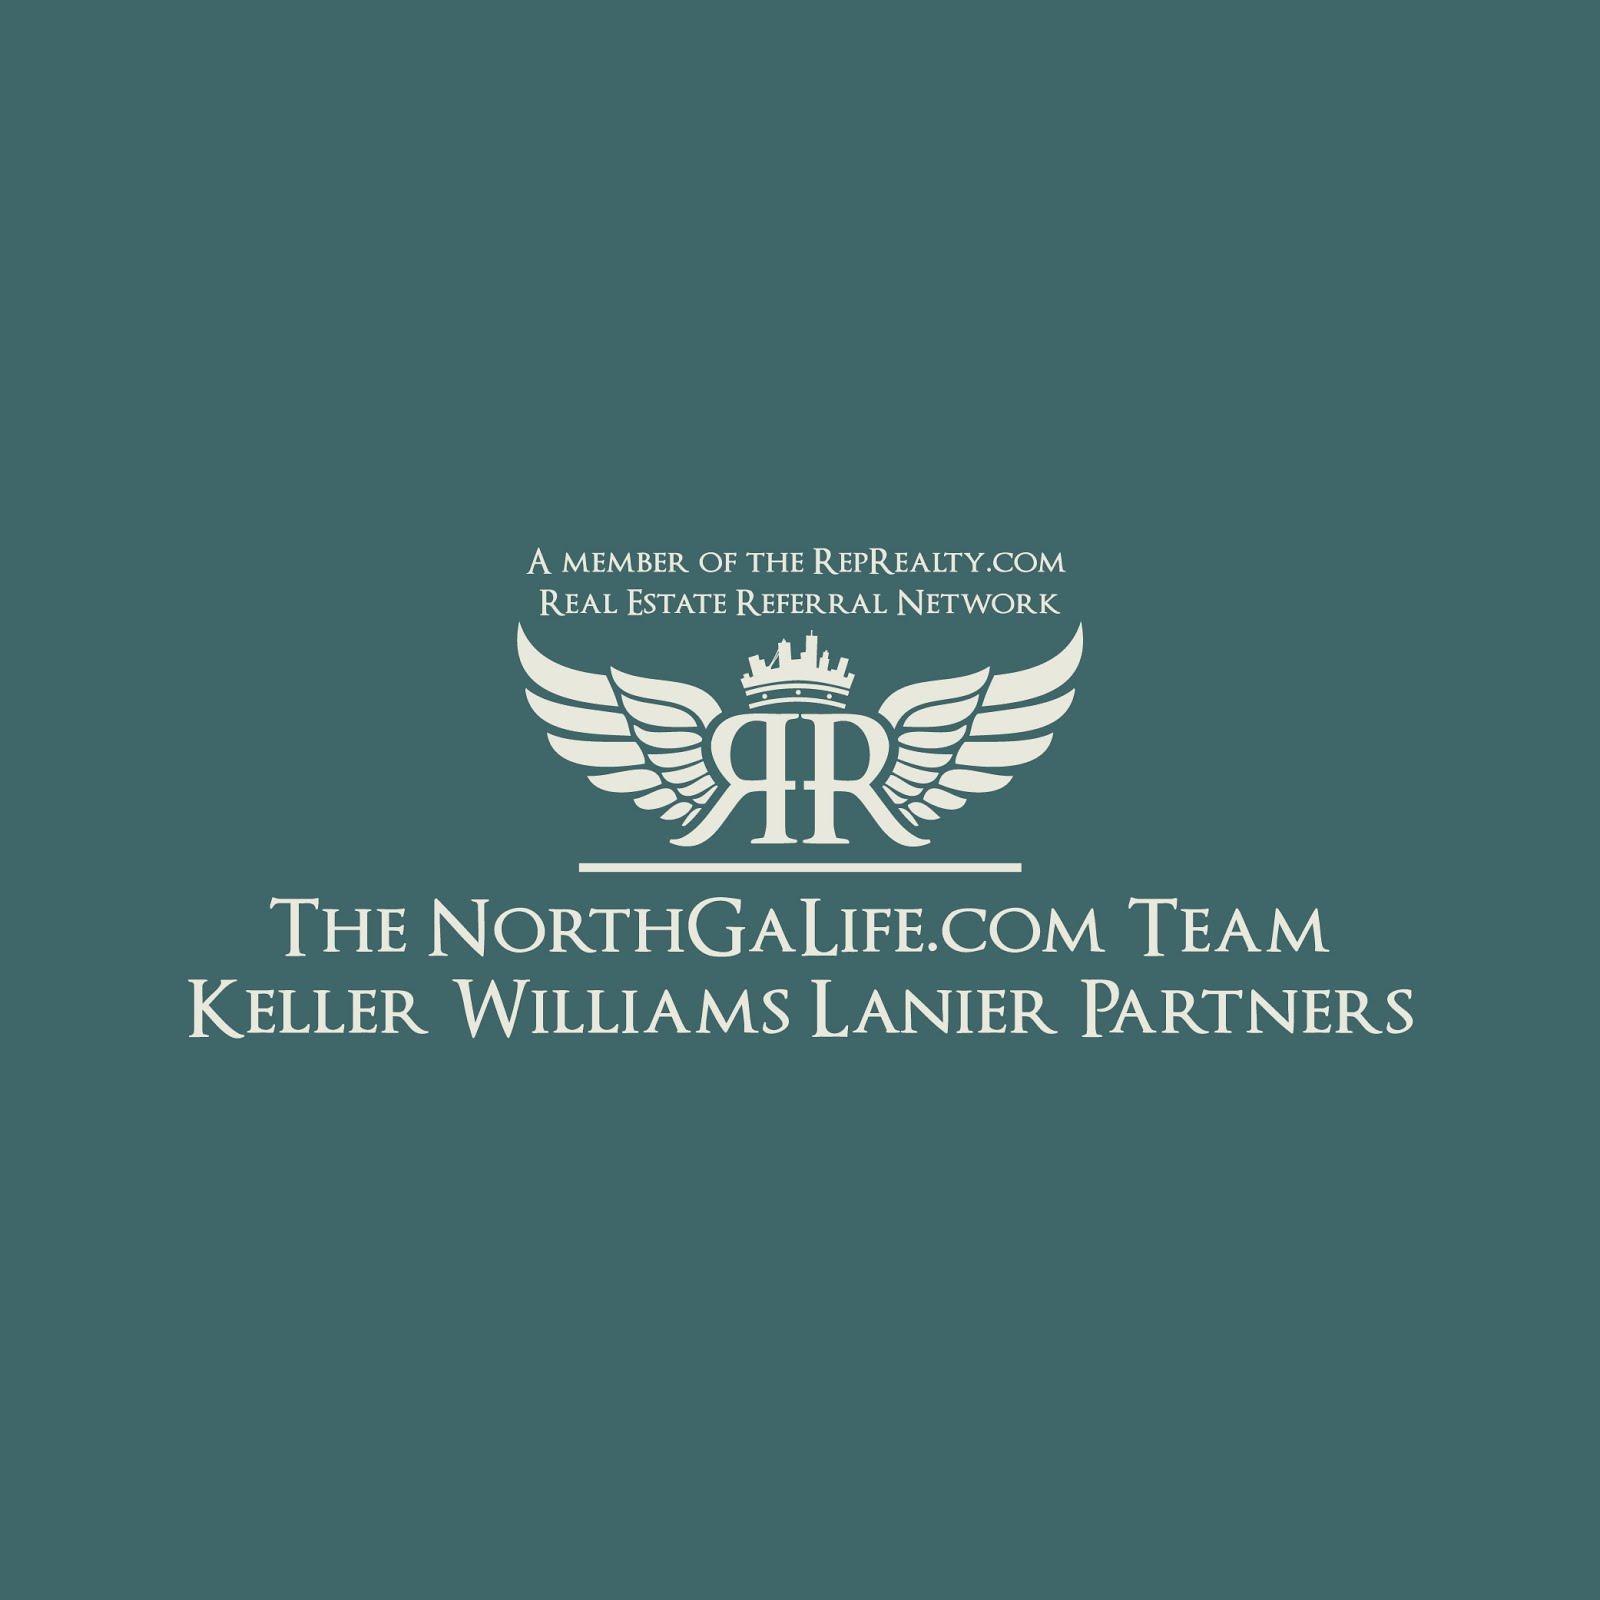 Laura Carter - Keller Williams Lanier Partners